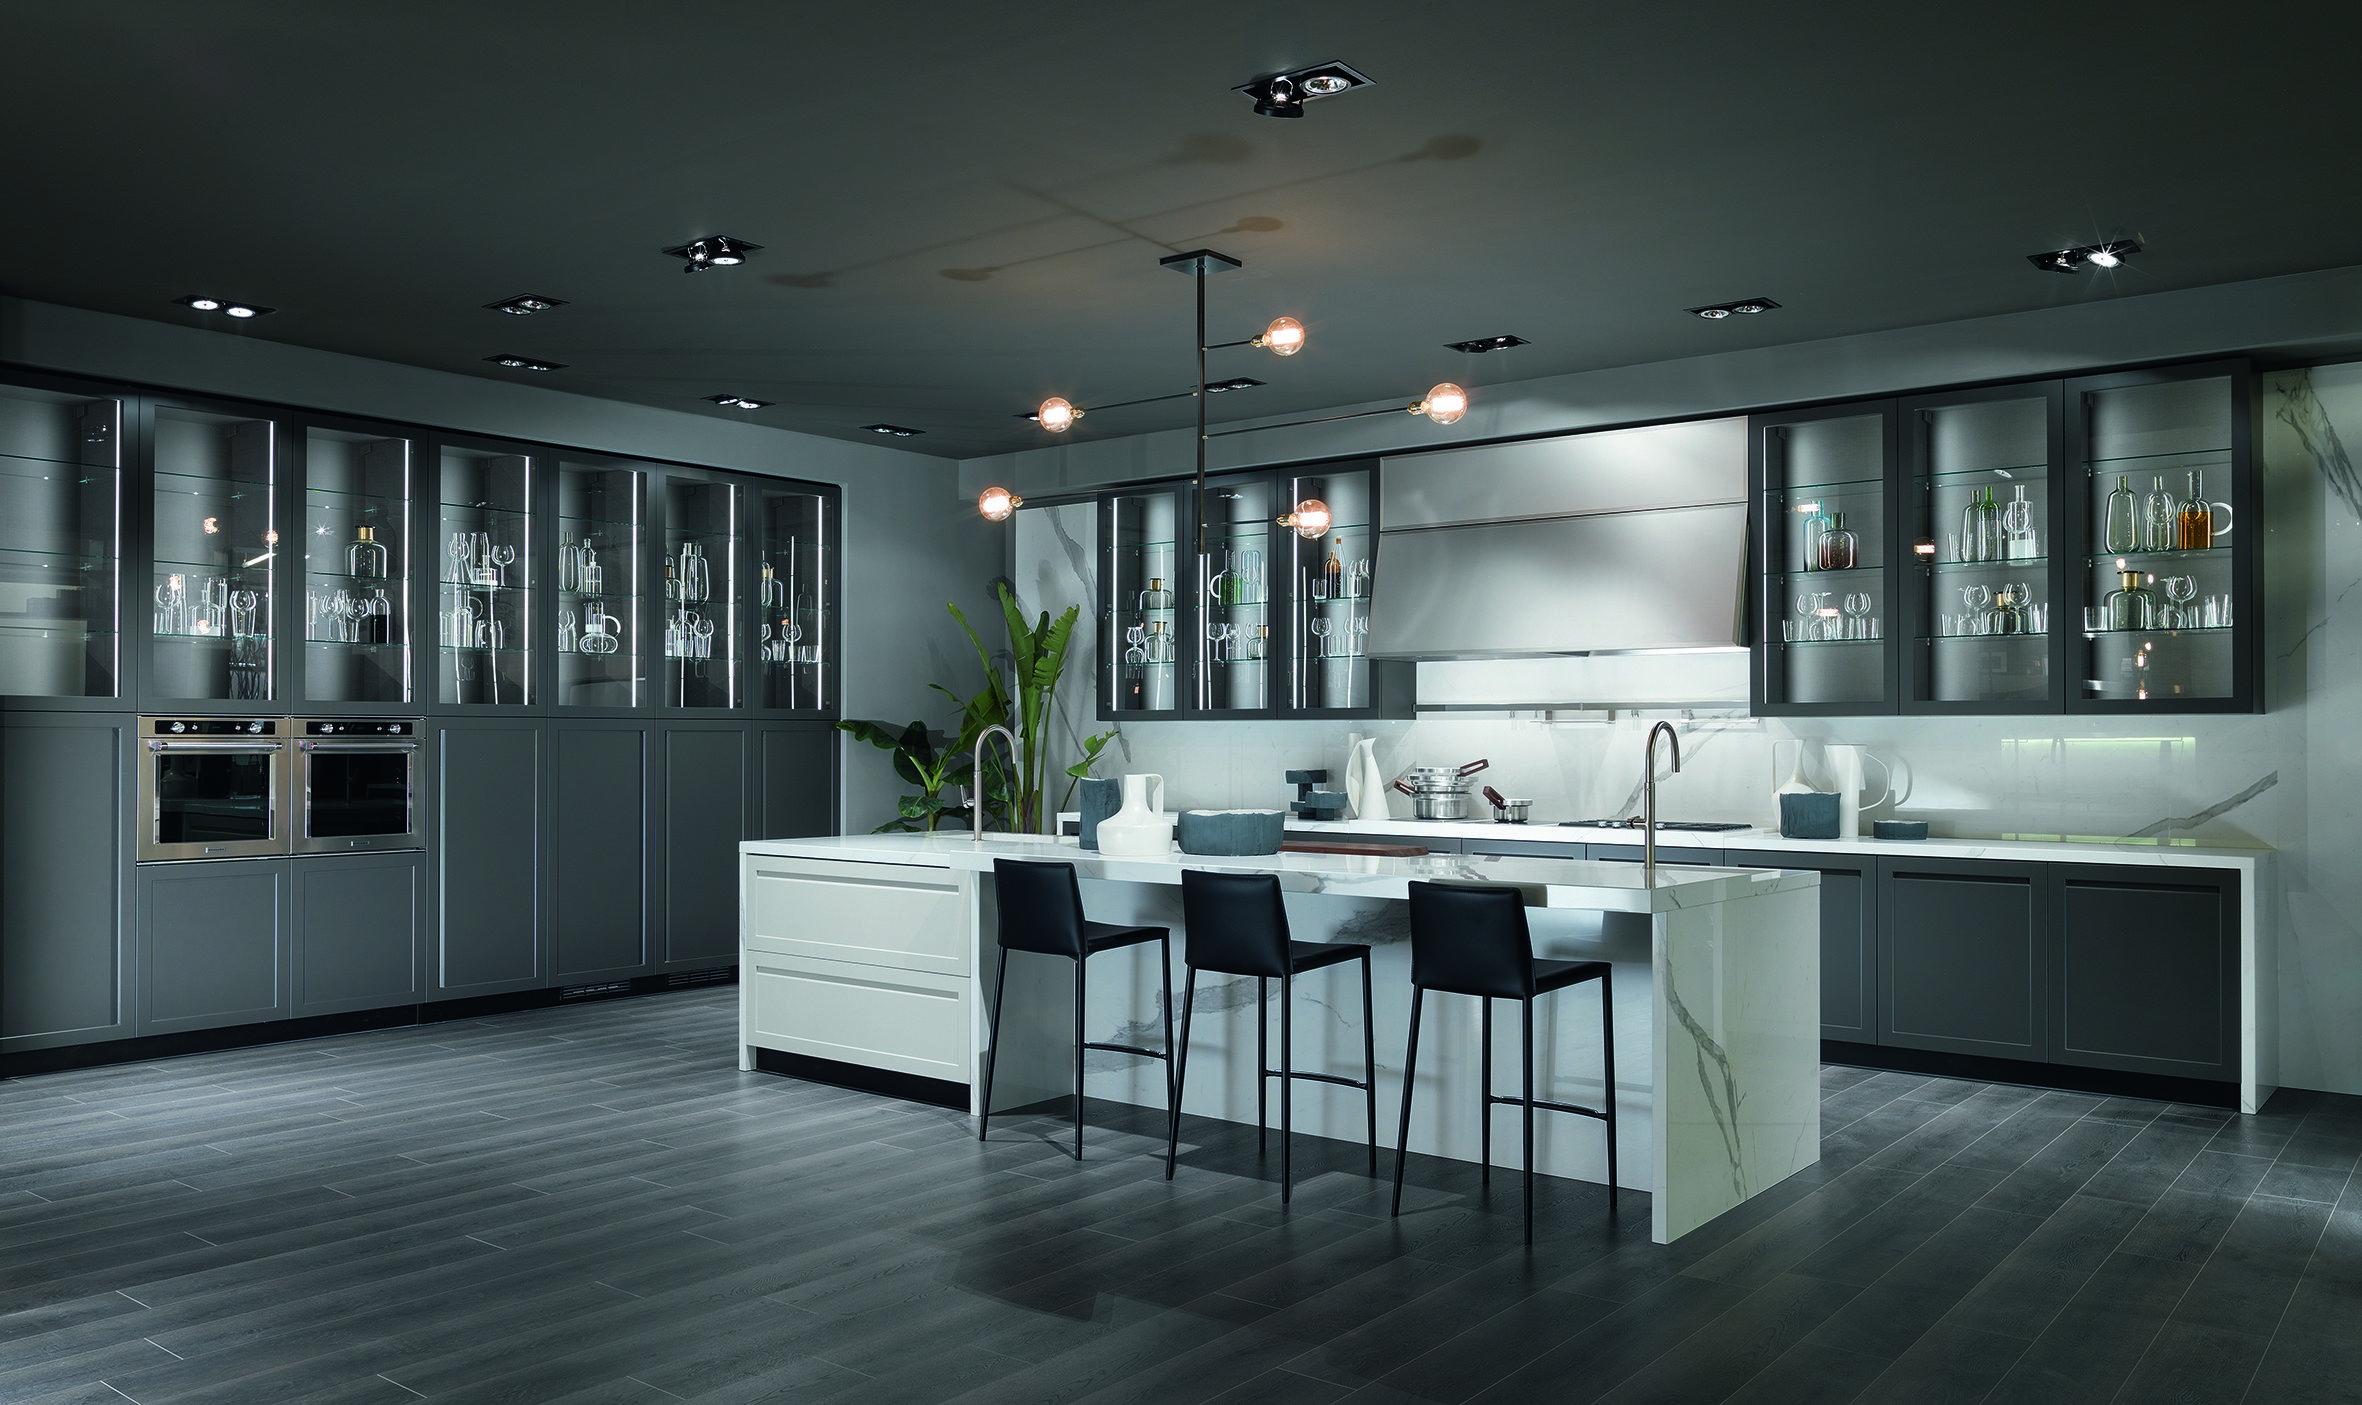 5 Kitchen Design Ideas from Salone del Mobile 2016 | Pinterest ...